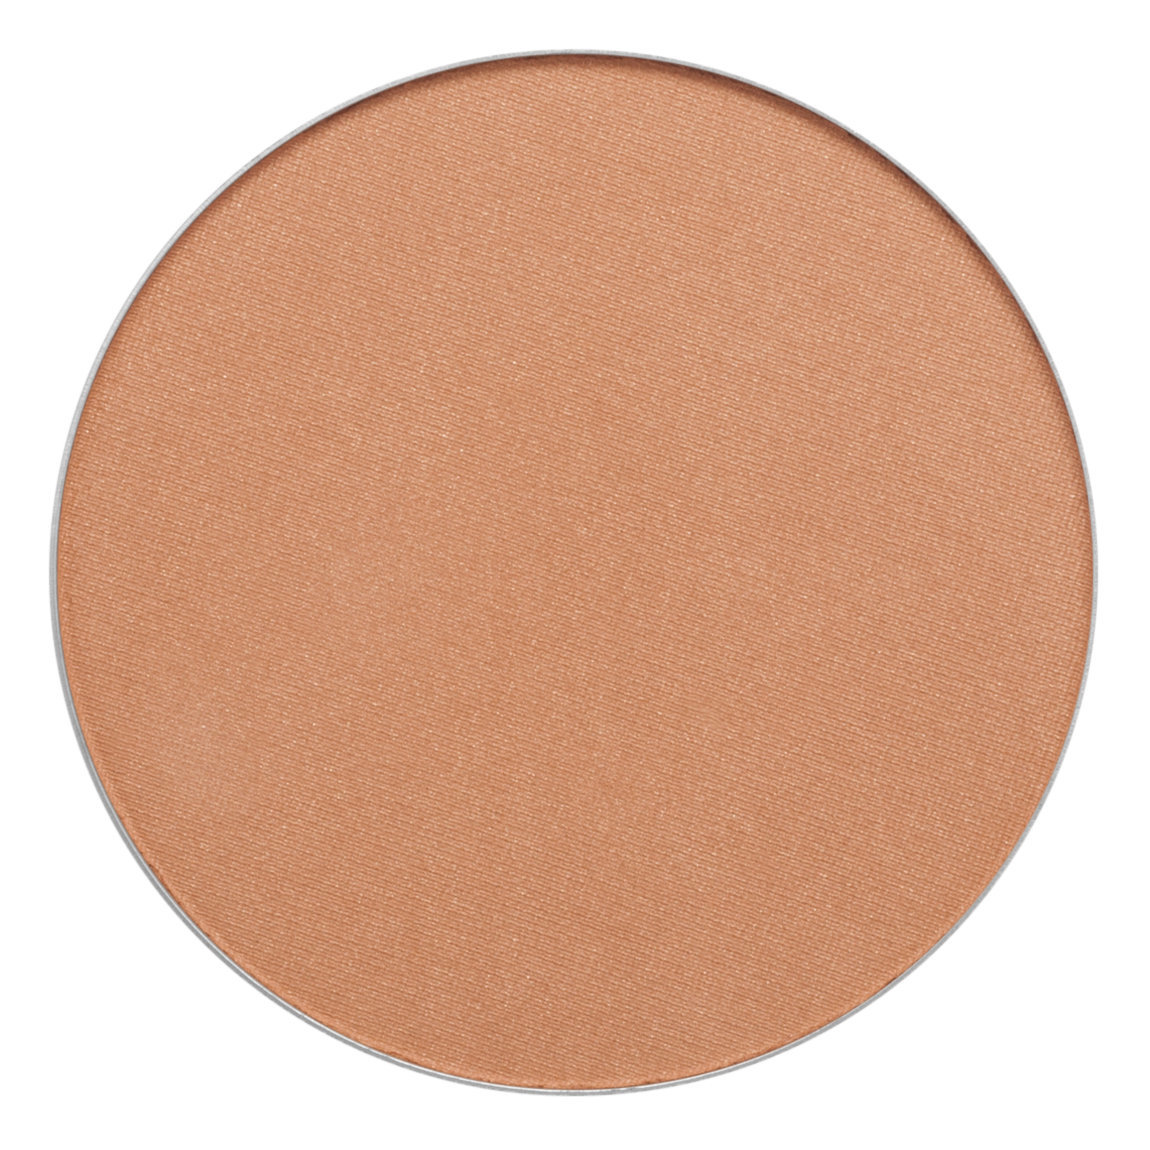 Inglot Cosmetics Freedom System AMC Bronzing Powder Round 74 product swatch.